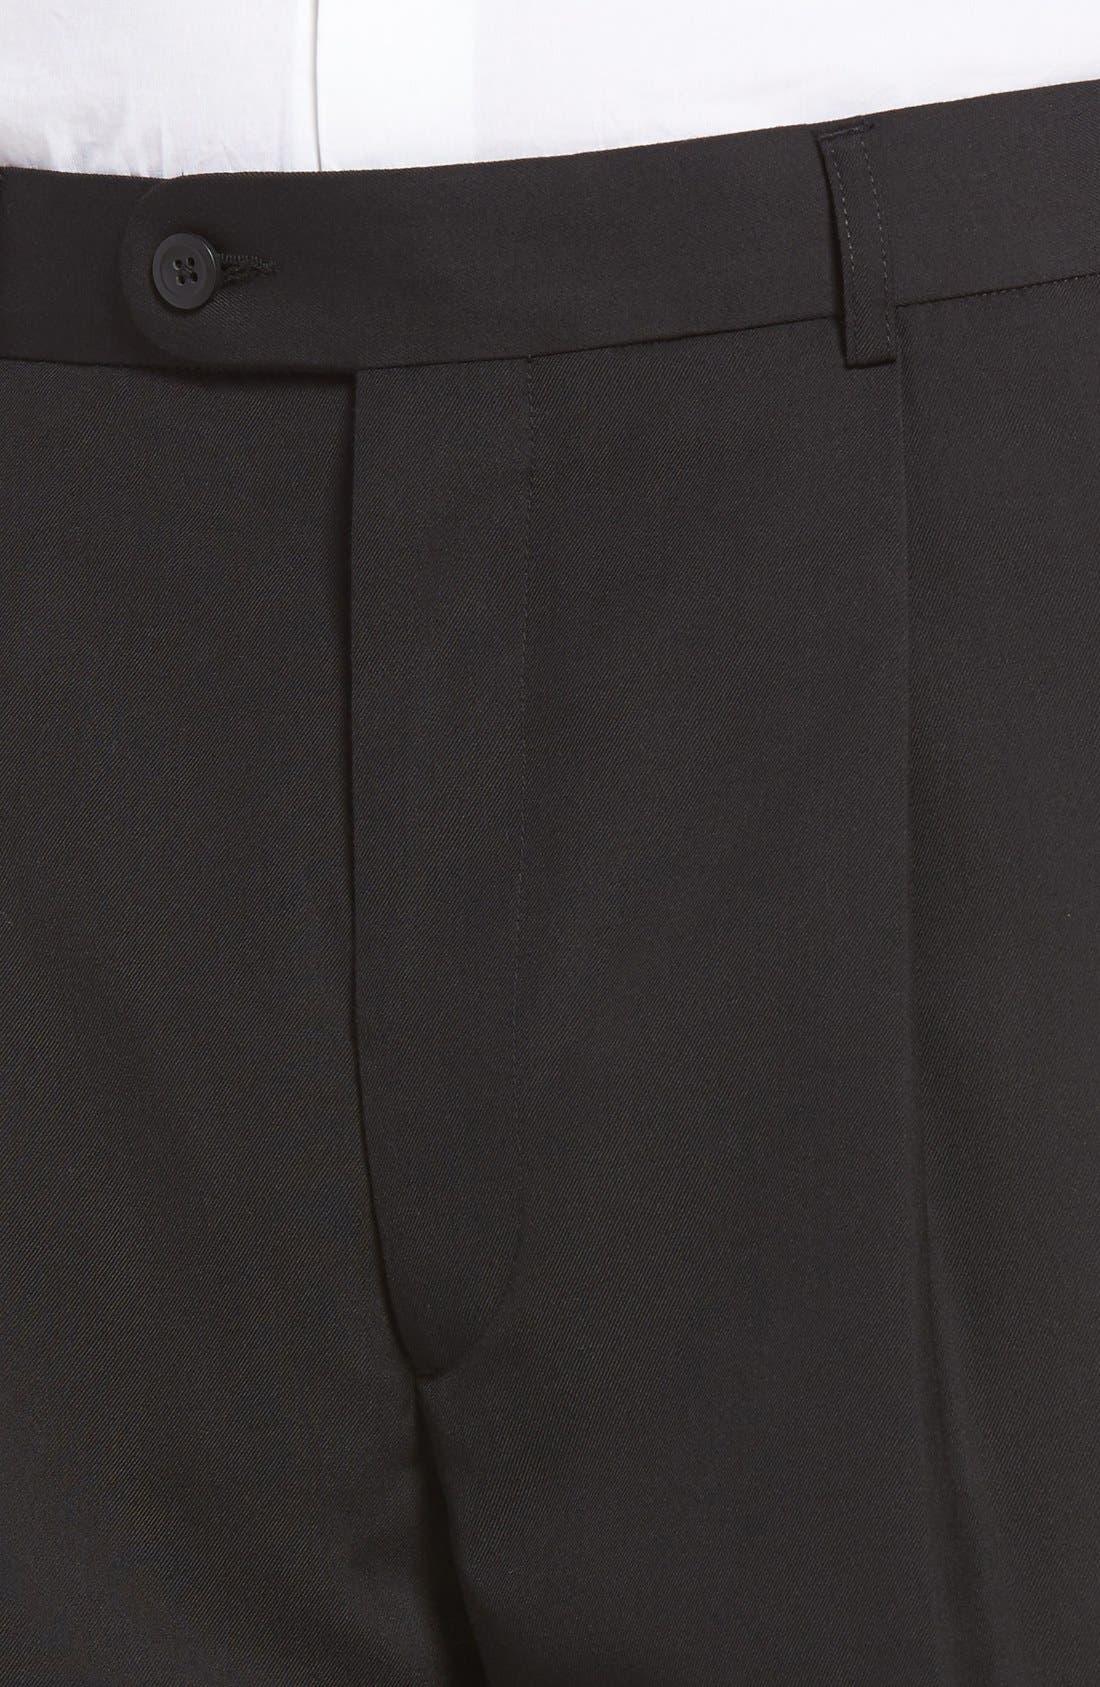 Pleated Microfiber Dress Pants,                             Alternate thumbnail 23, color,